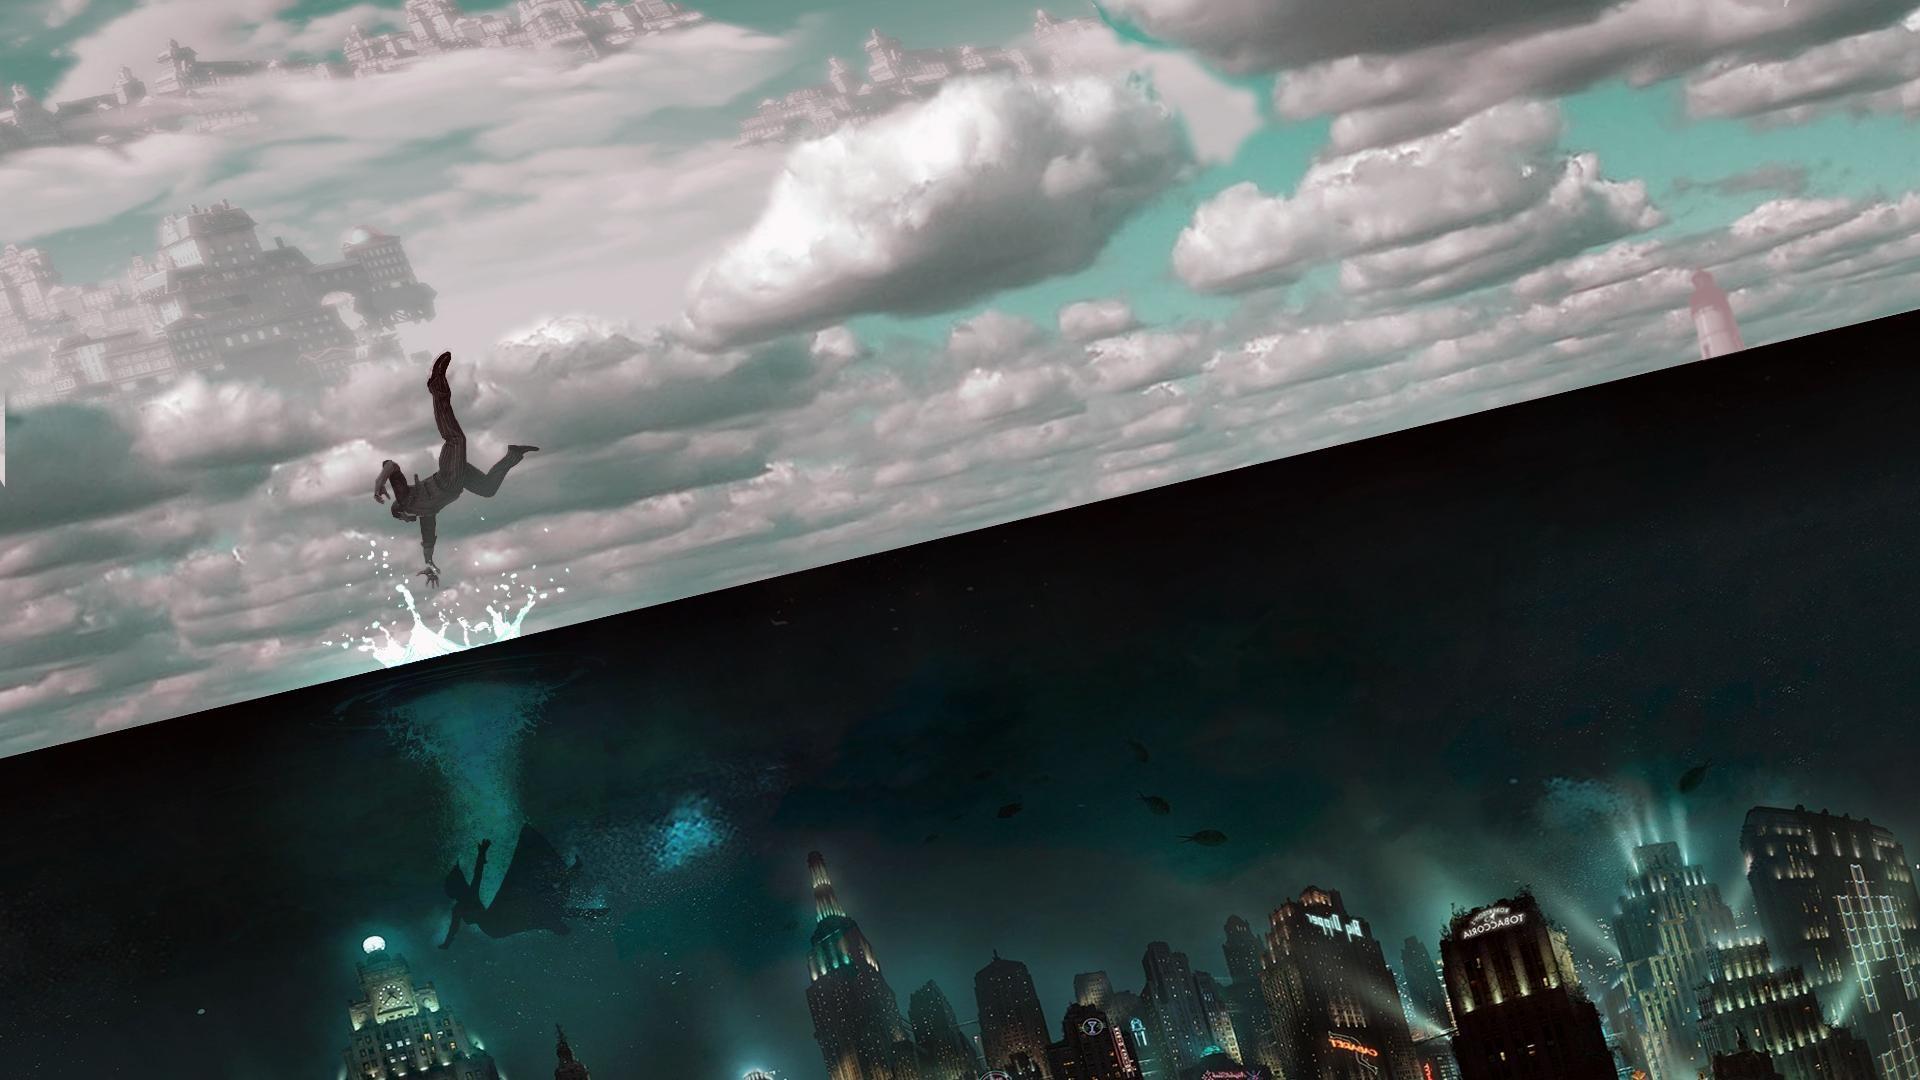 Photos-Bioshock-Wallpaper-High-Quality